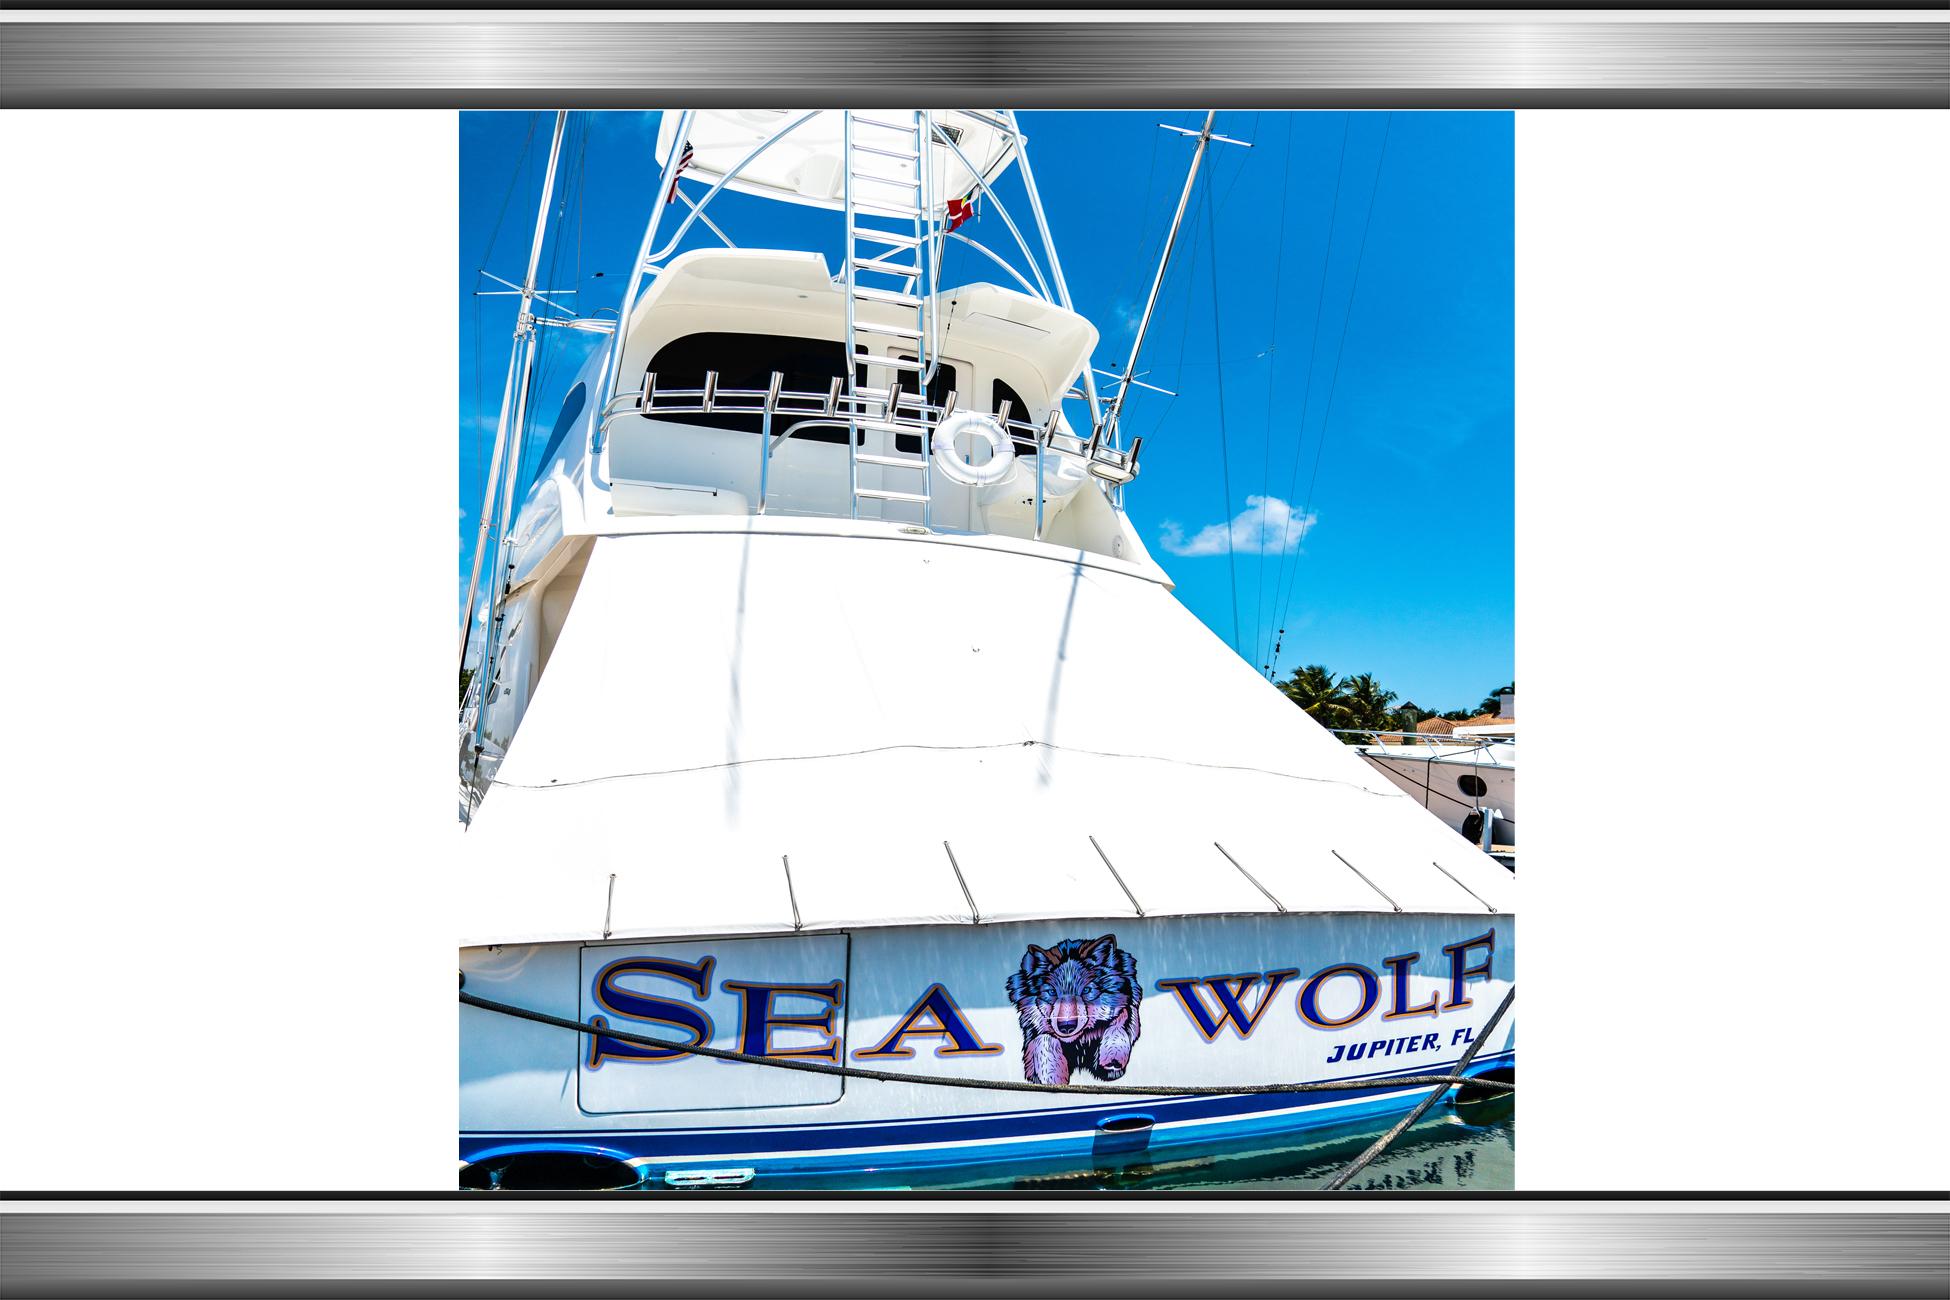 SEA WOLF_REV LAYERS LARGE_1B.jpg